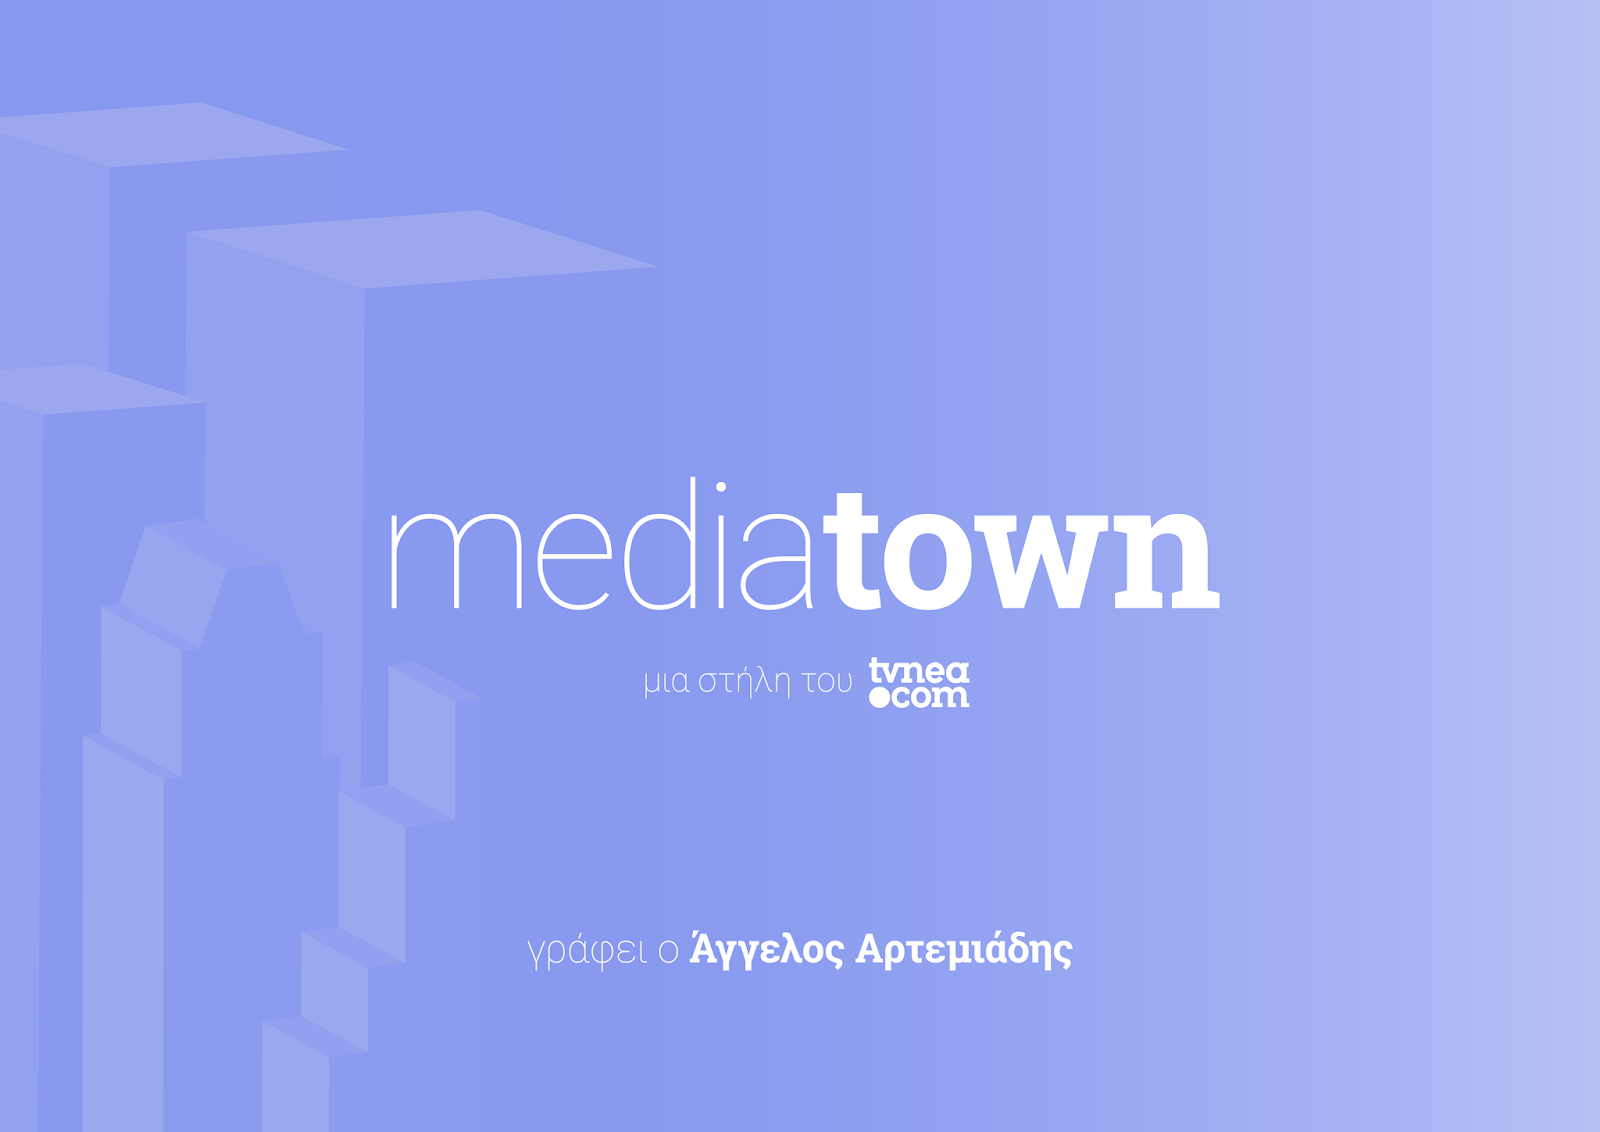 Mediatown: Το δώρο του ΑΝΤ1 στο STAR, φαβορί το Master chef, η πρόβλεψη για το Καφέ της Χαράς, η συμπεριφορά του ΣΚΑΪ και η αλήθεια για το Mega... - Φωτογραφία 1